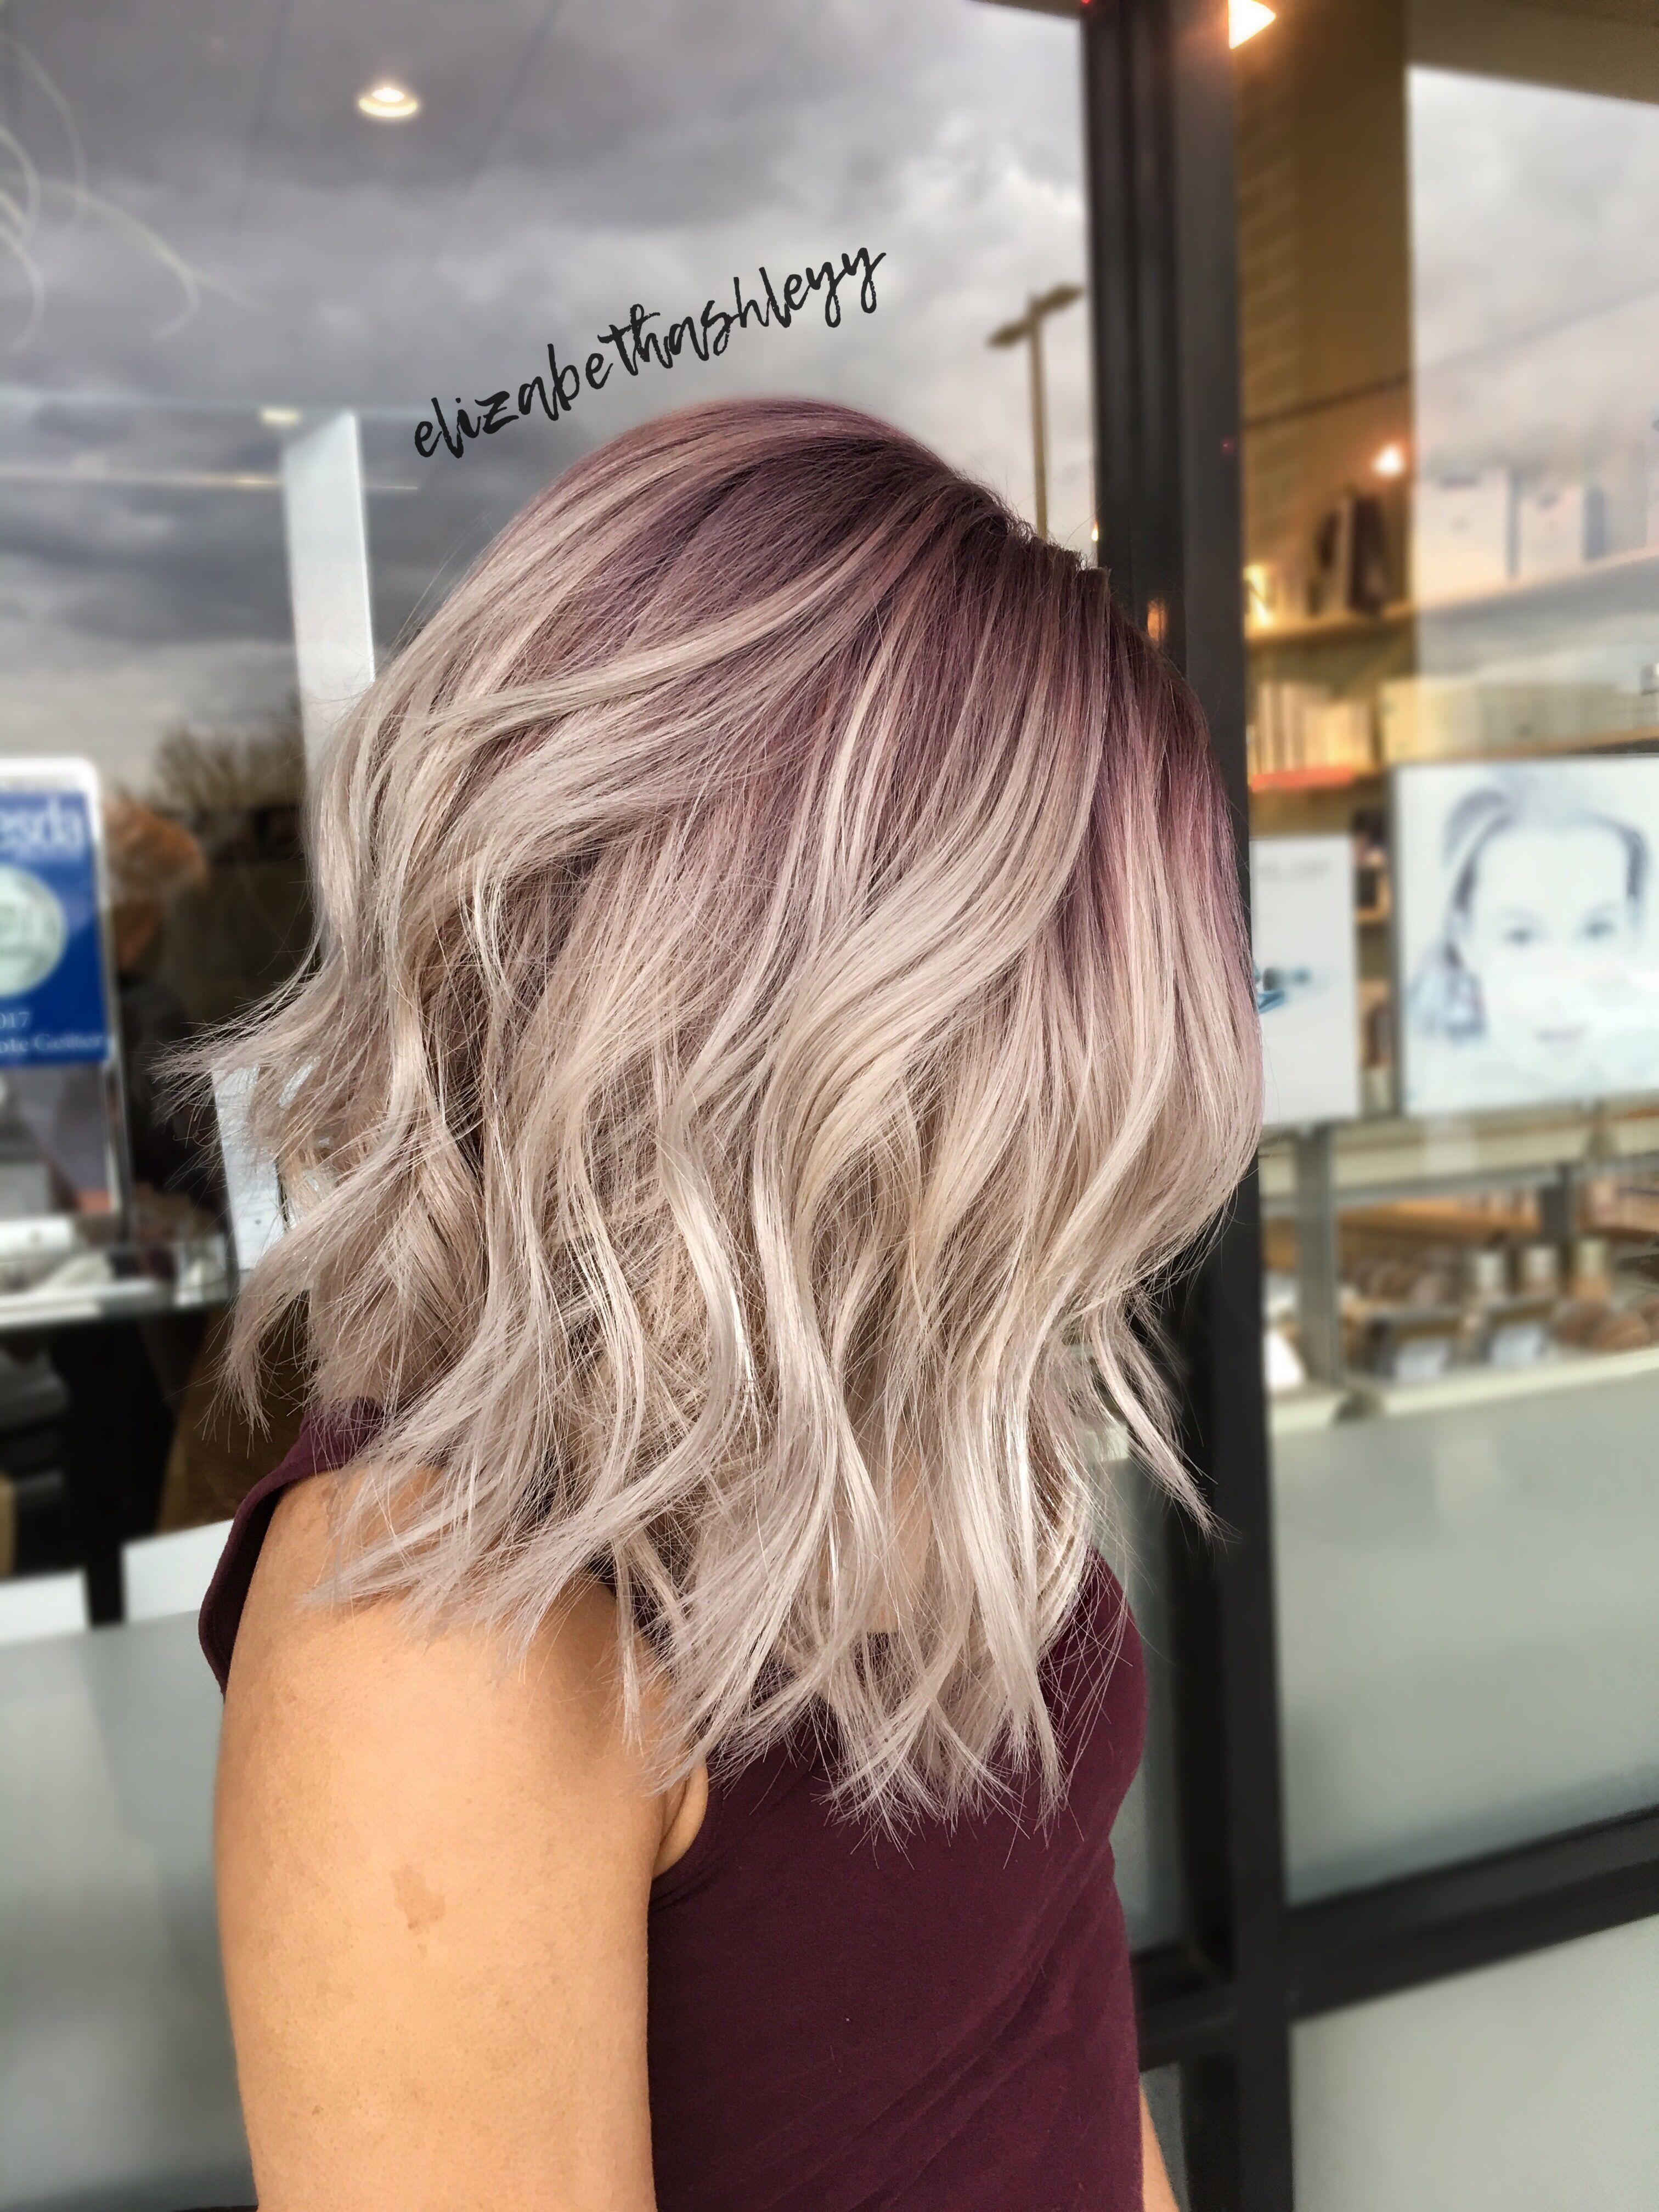 Best 25+ Blonde hair purple roots ideas on Pinterest ...